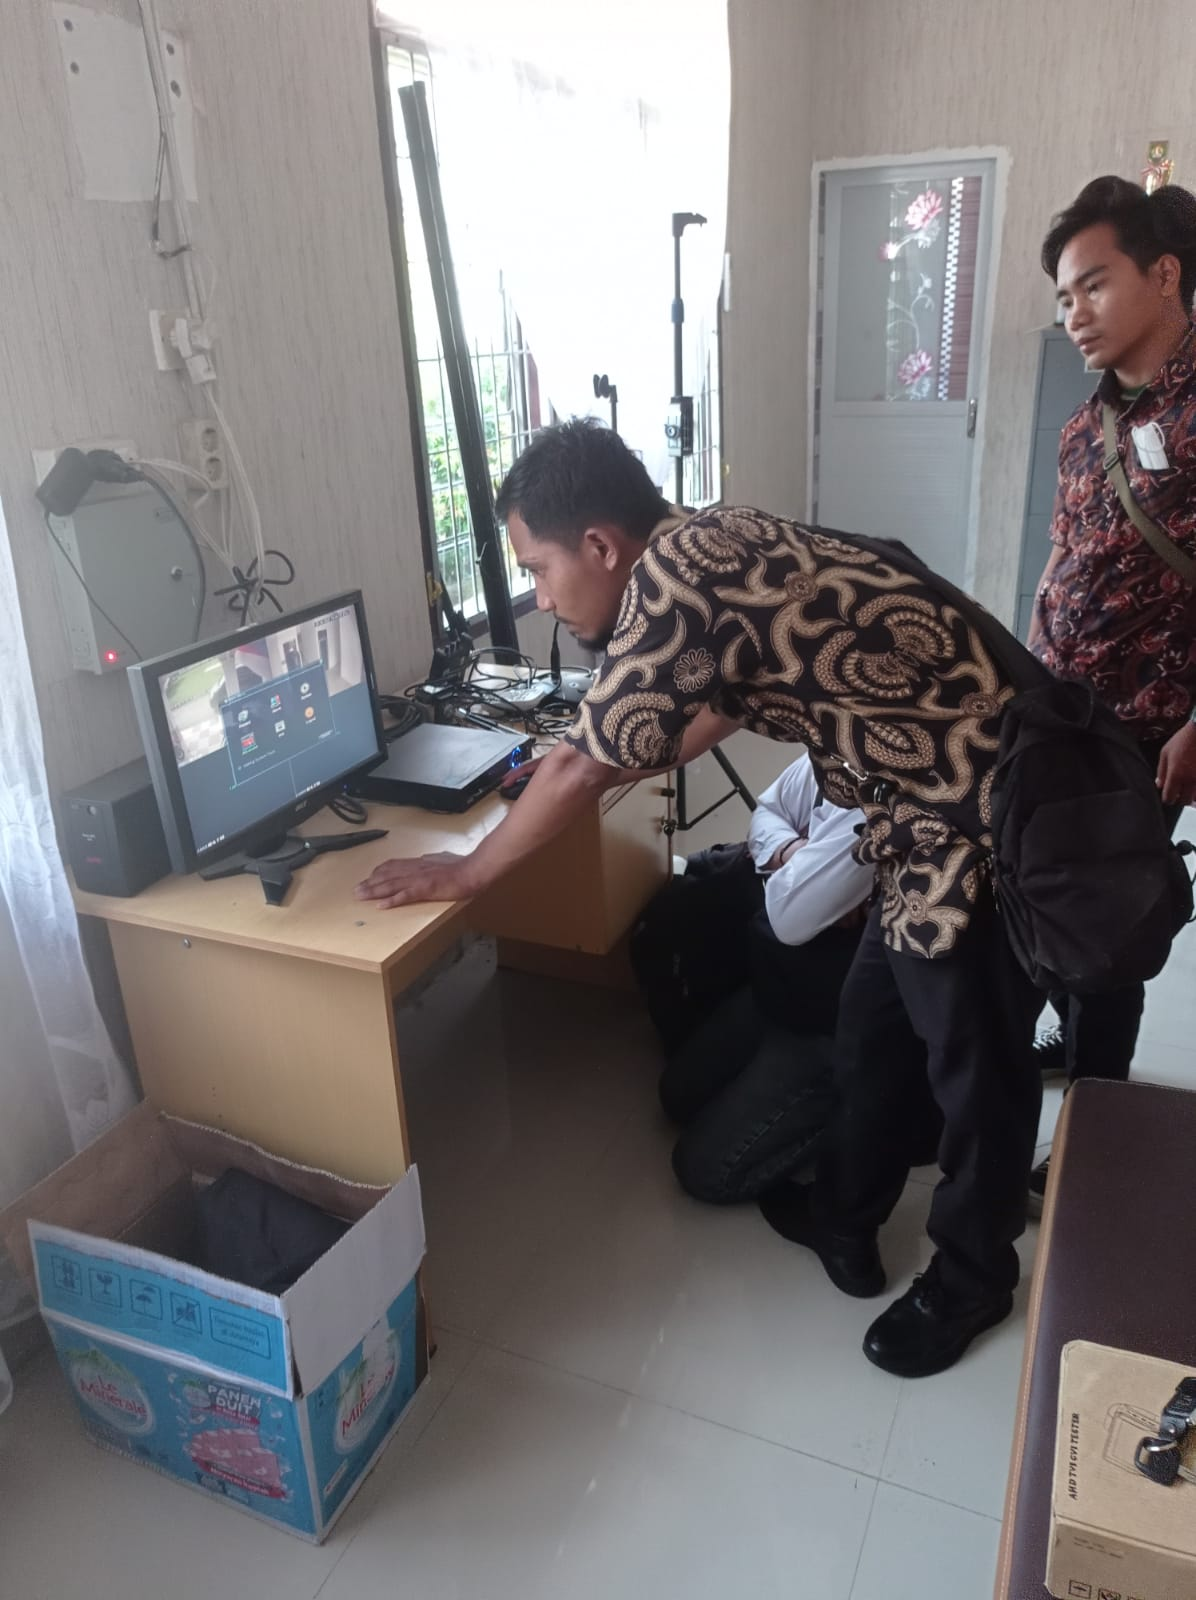 PERBAIKAN KONEKSI JARINGAN INTERNET DAN CCTV DI KECAMATAN AEK KUASAN